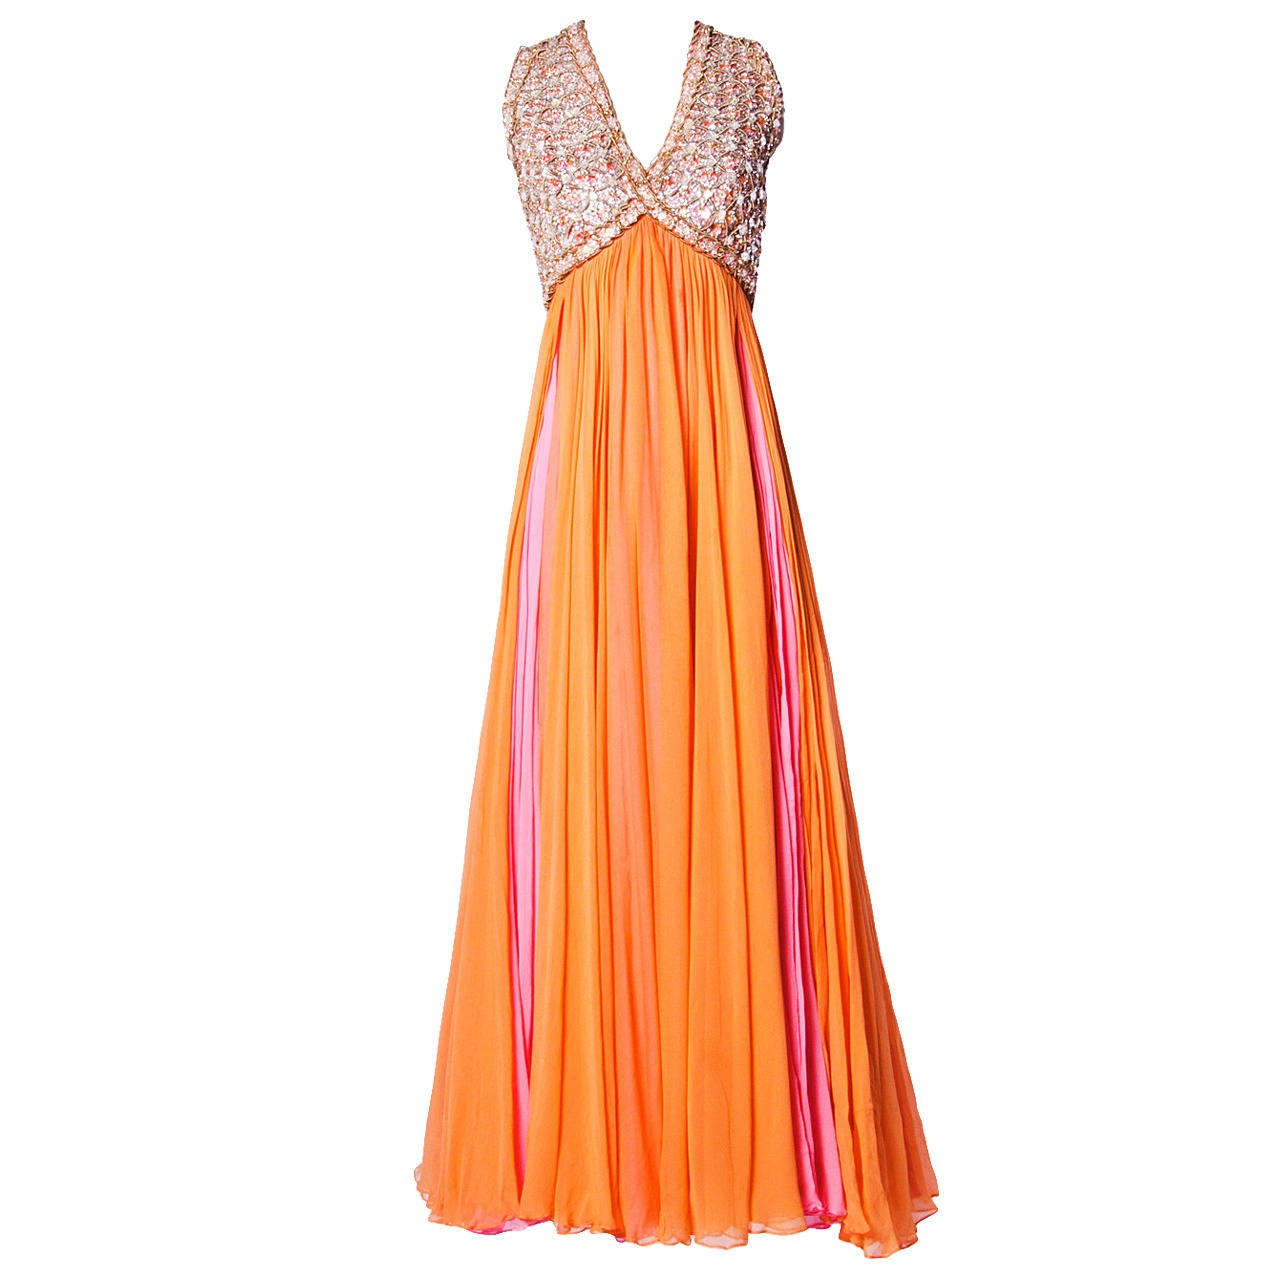 Victoria Royal Ltd. Vintage 1960s 60s Sequin + Beaded Silk Chiffon Maxi Dress 1